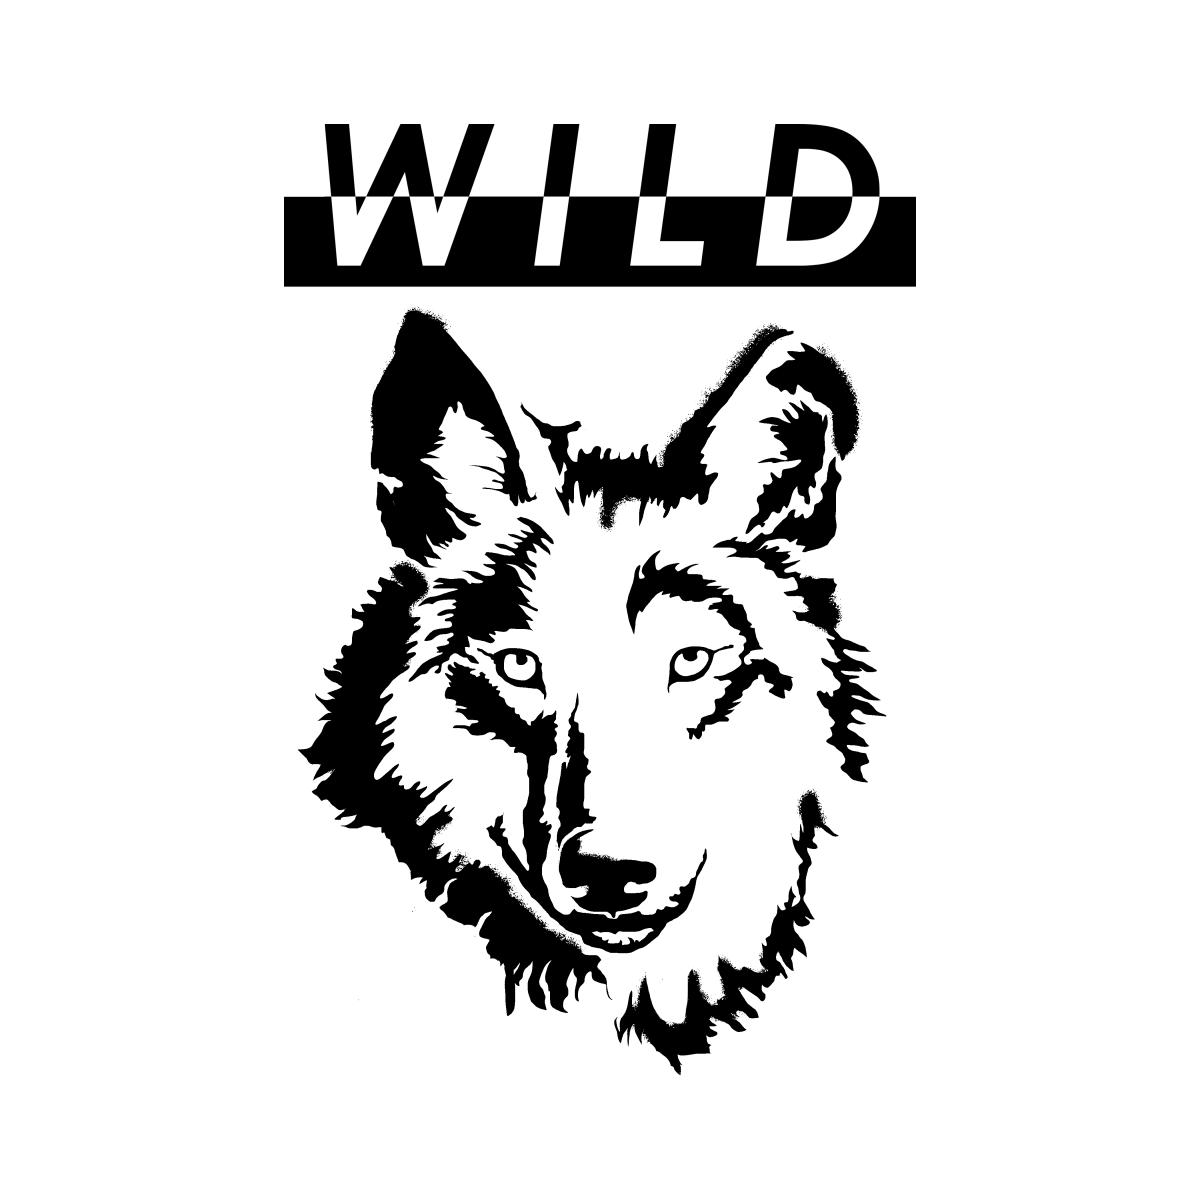 картинки с волками граффити ооо